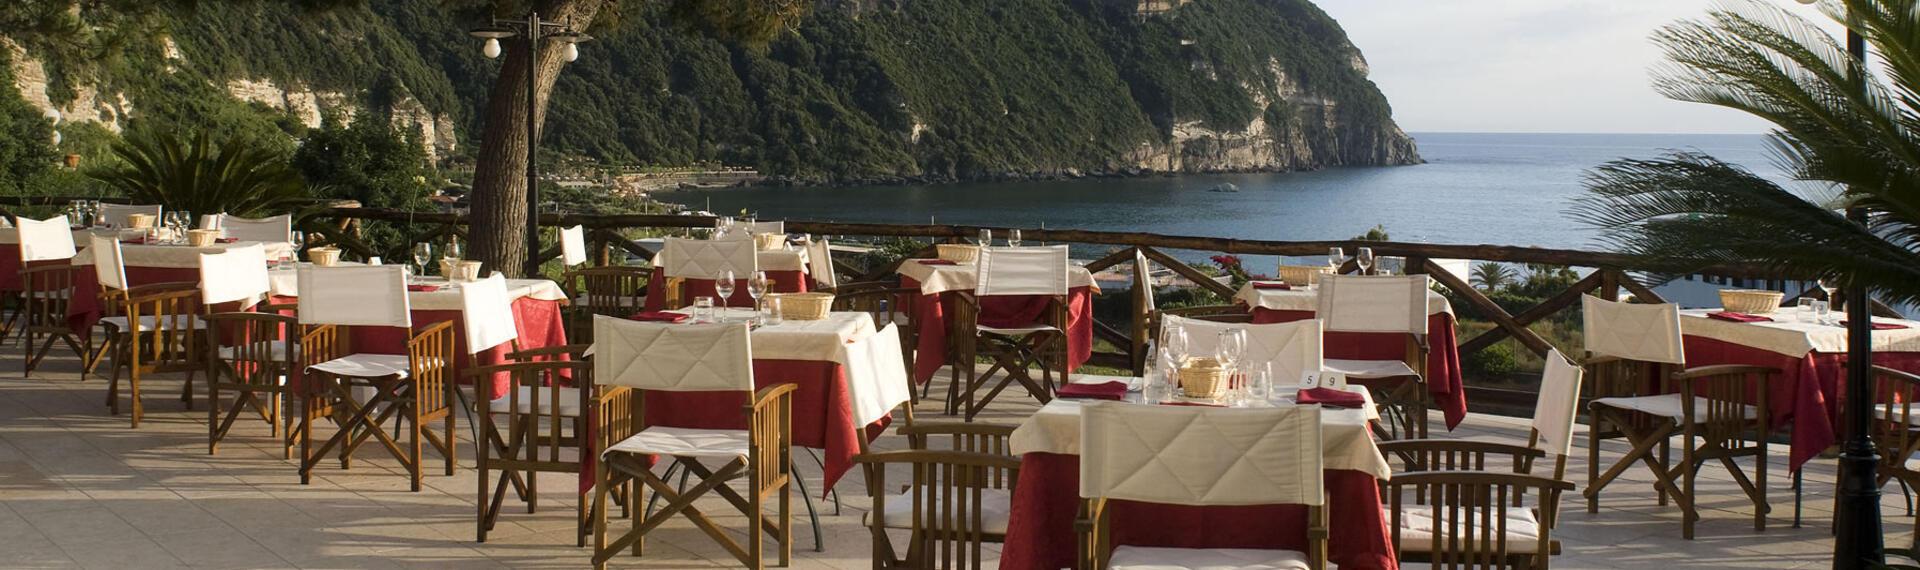 hotelvillabianca it i-ristoranti 010